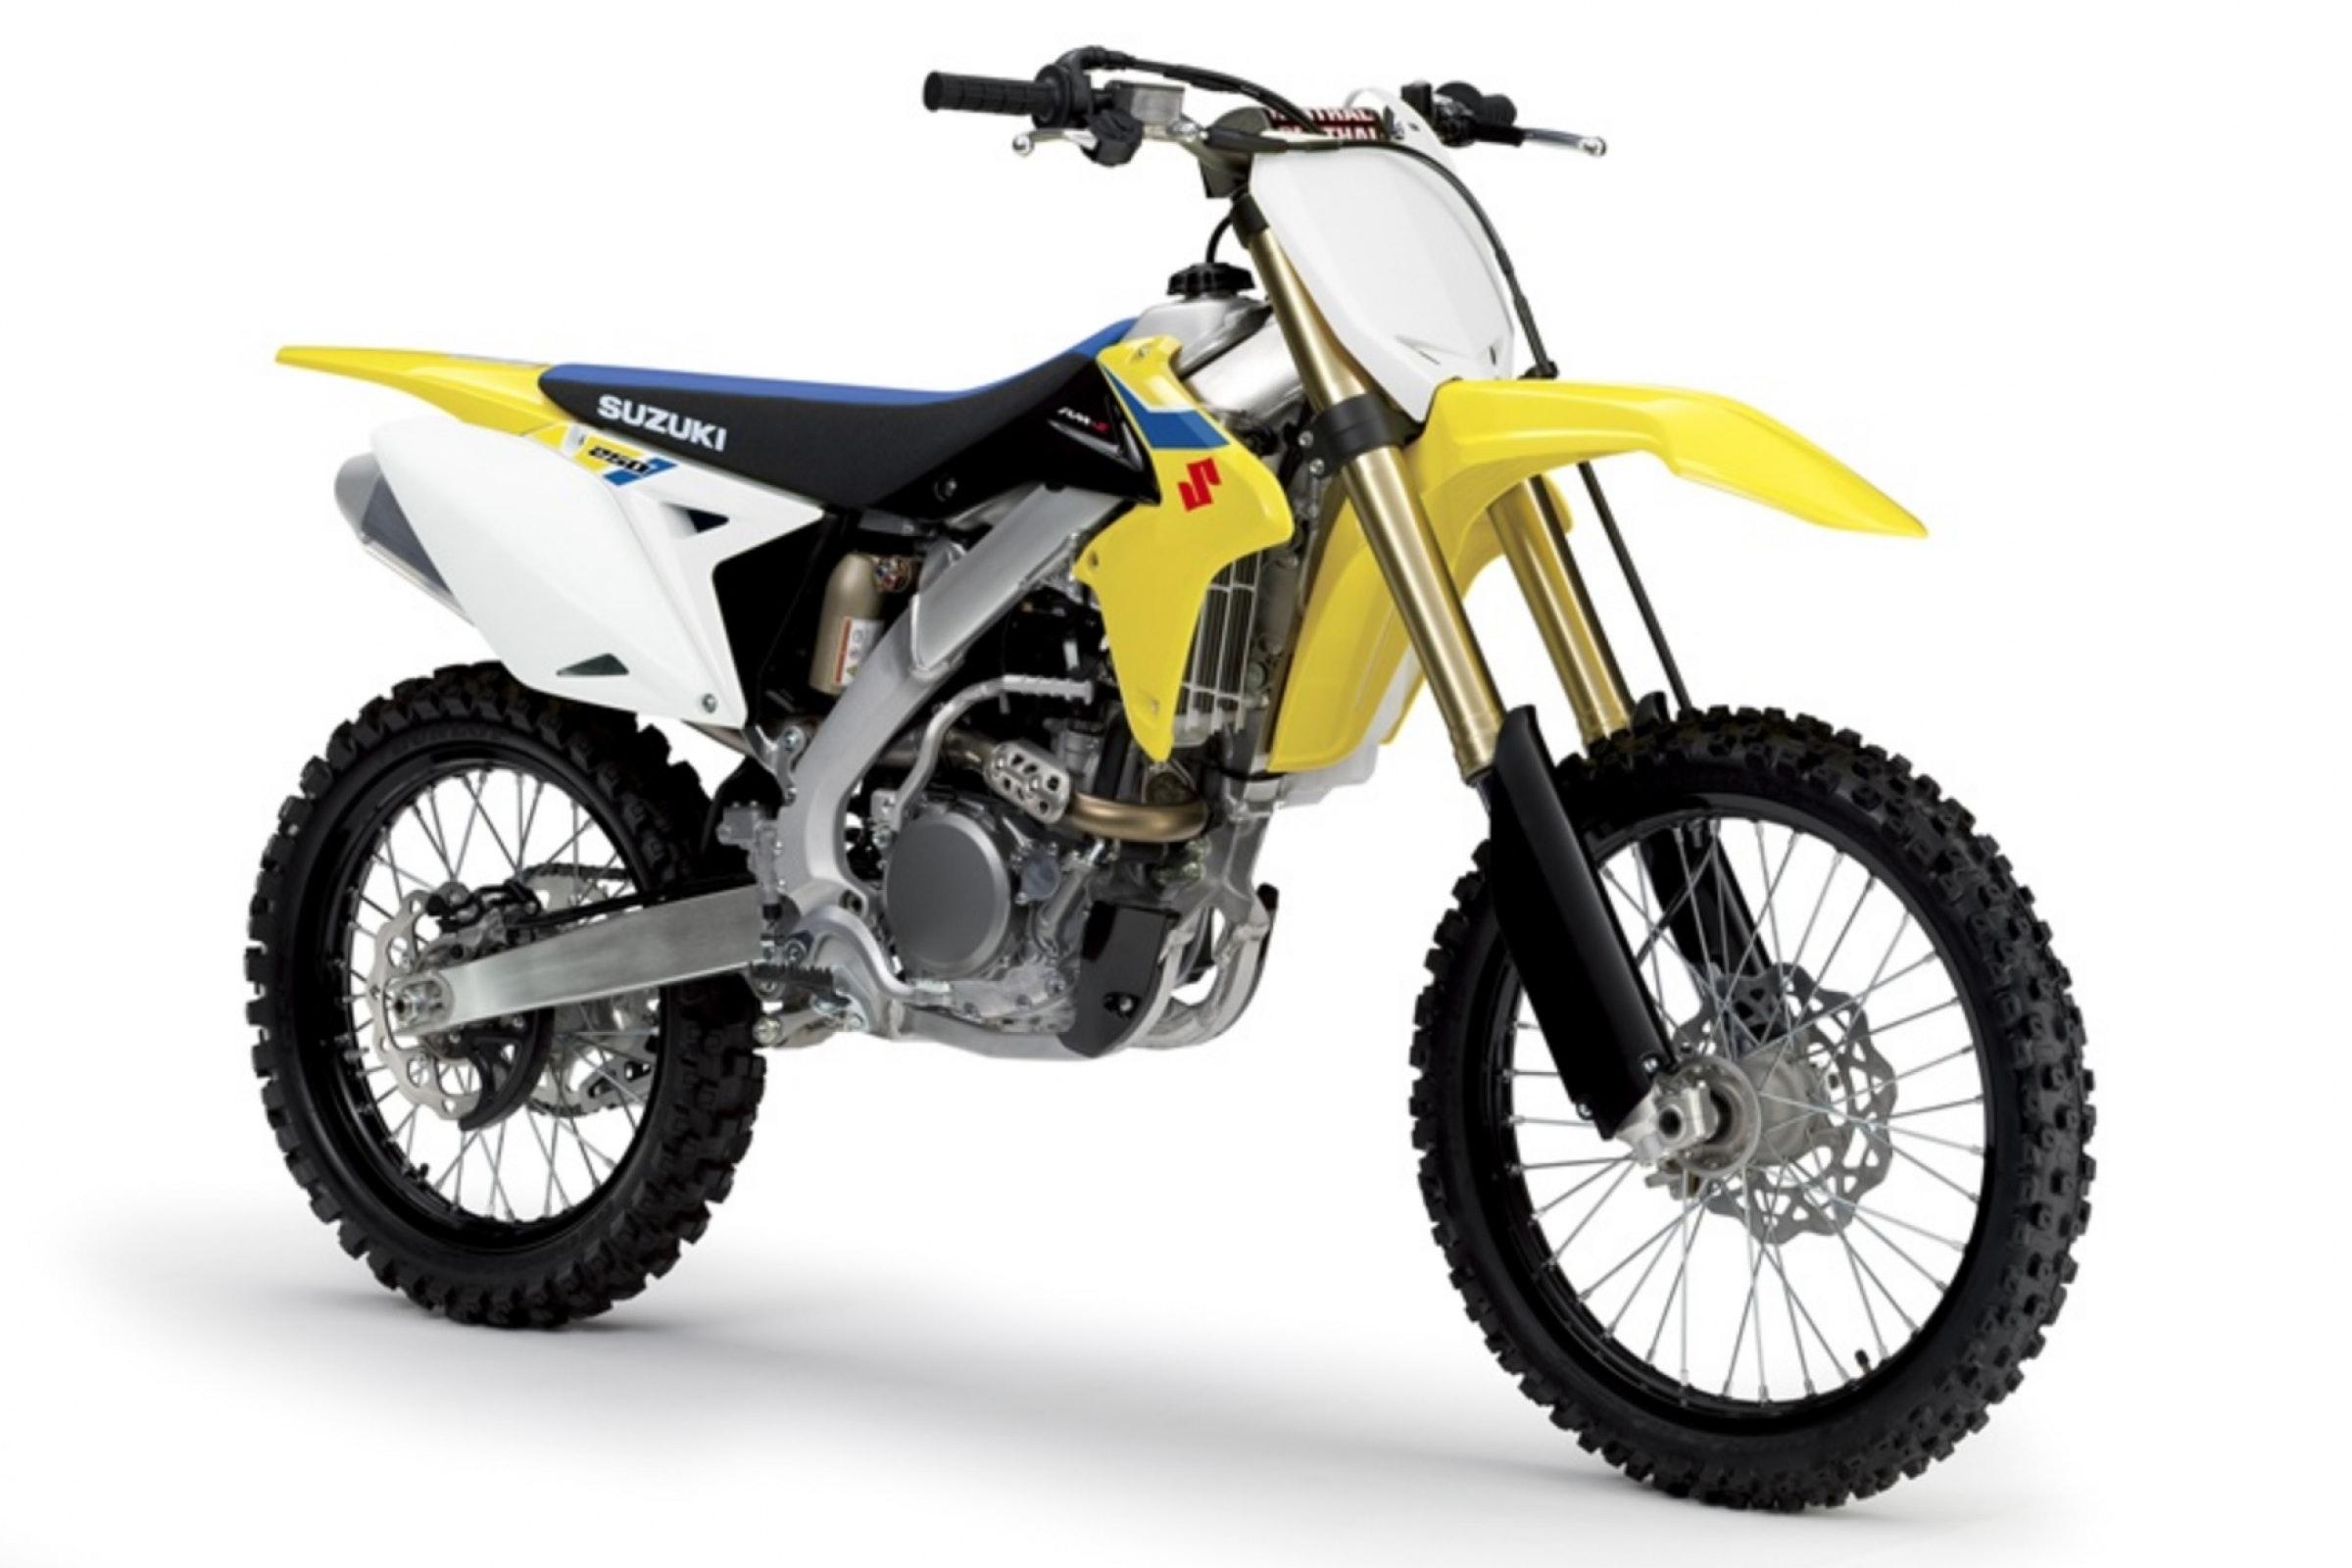 2018 suzuki motocross. perfect suzuki suzuki announces 2018 rmz250 and offroad models to suzuki motocross